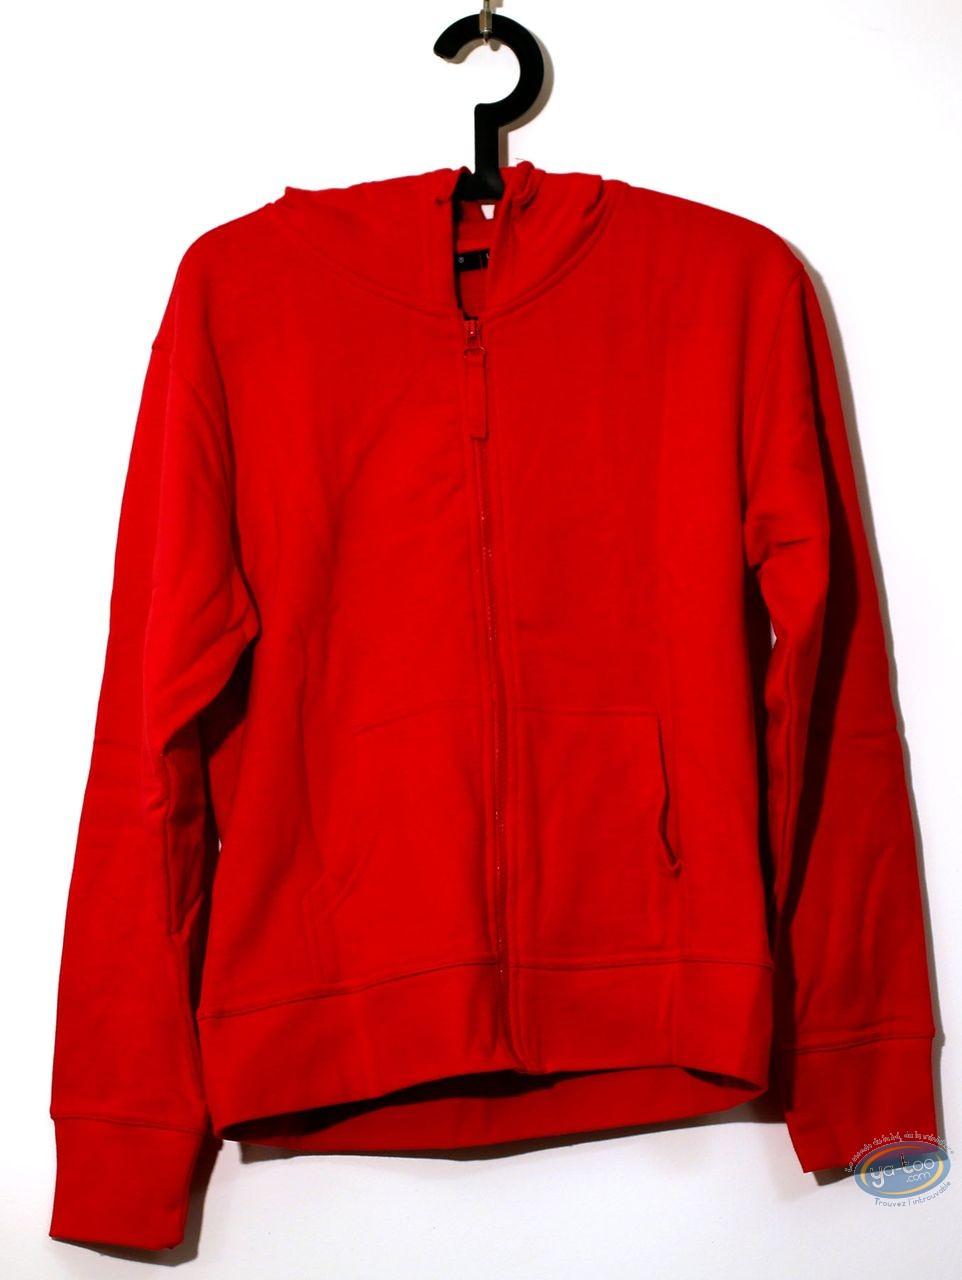 Clothes, Corto Maltese : Sweat-shirt, Corto Maltese : Hood Woman 04-02 size S